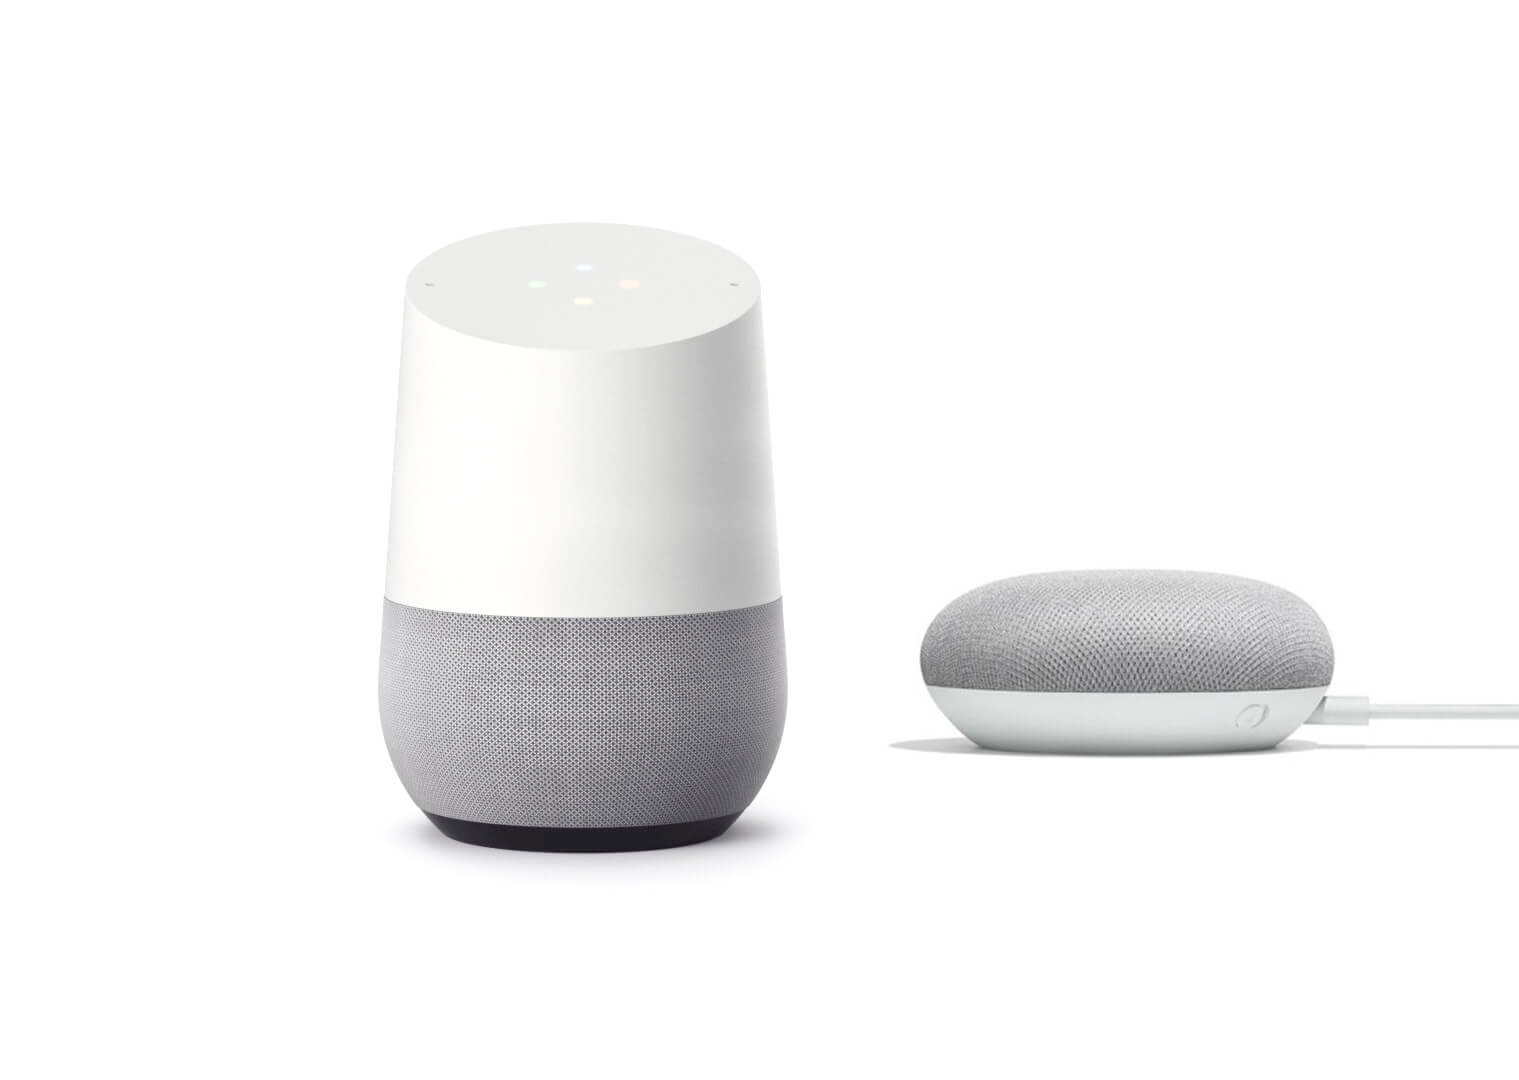 google home integration mit NEO - Smart home